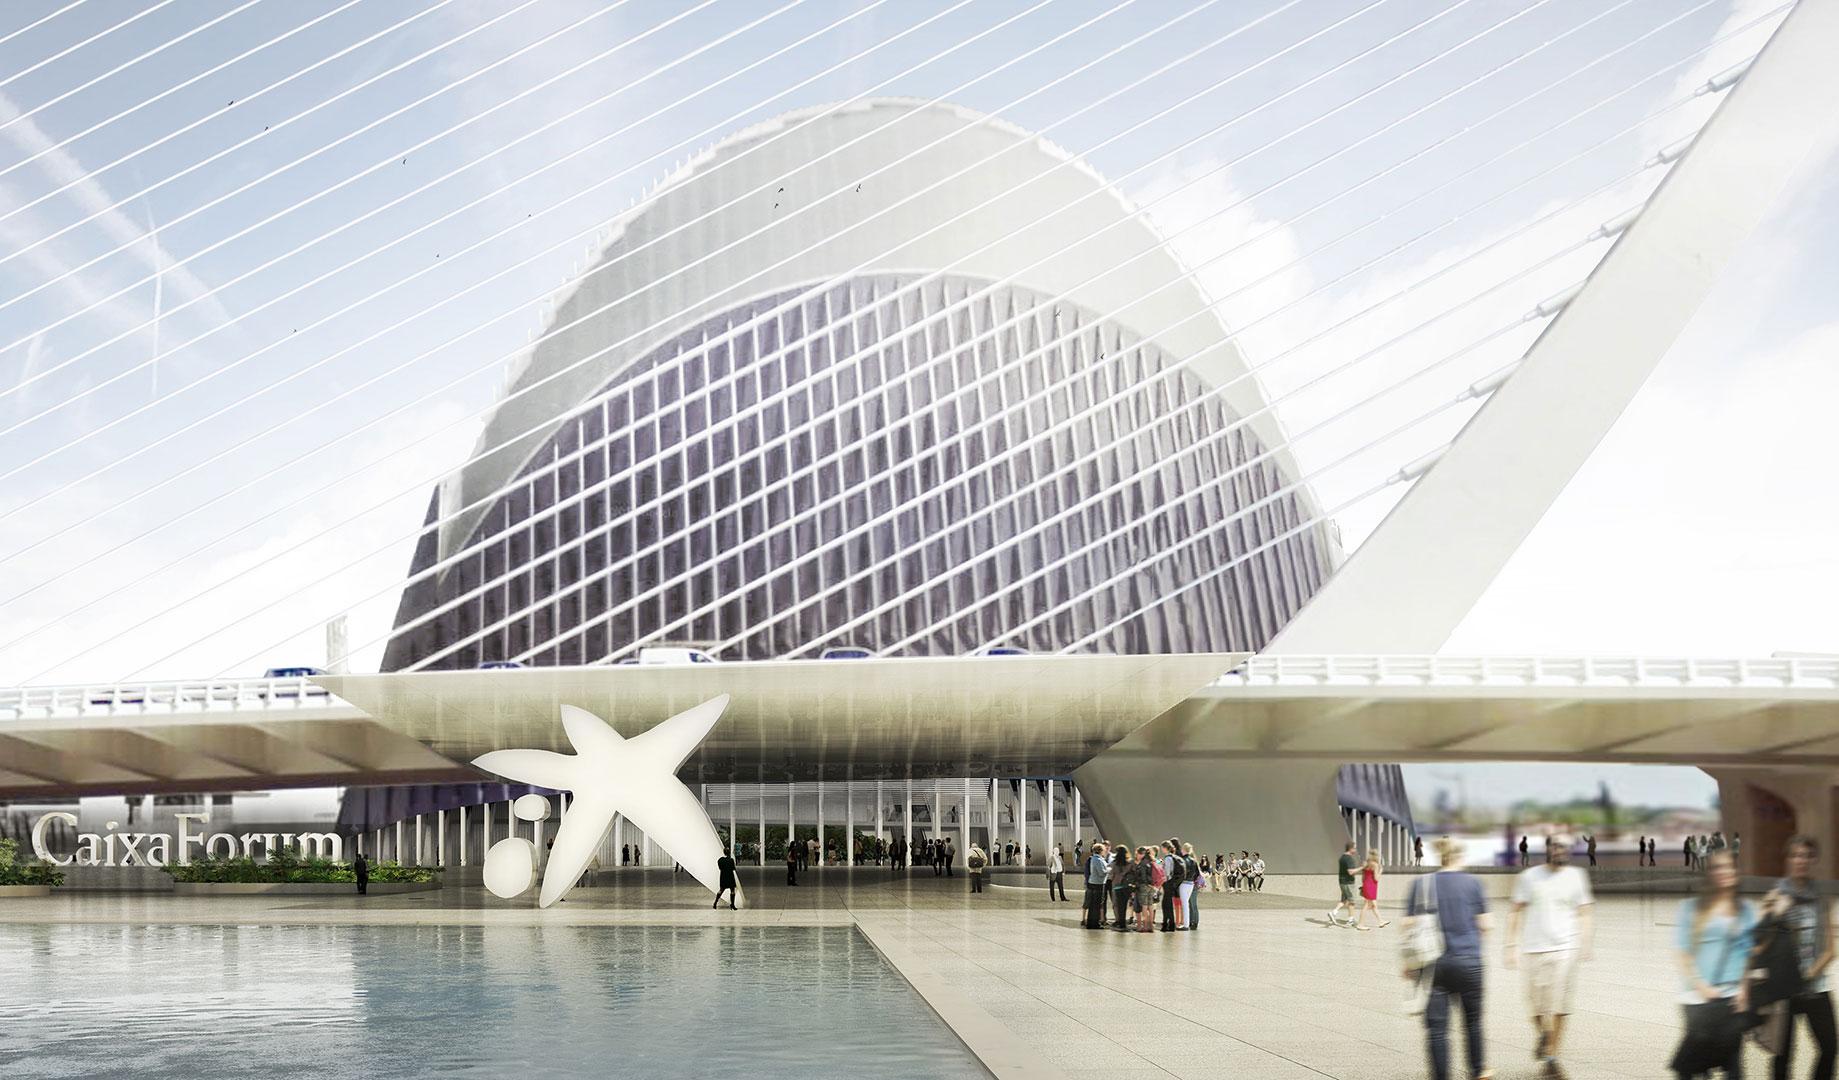 CaixaForum Valencia